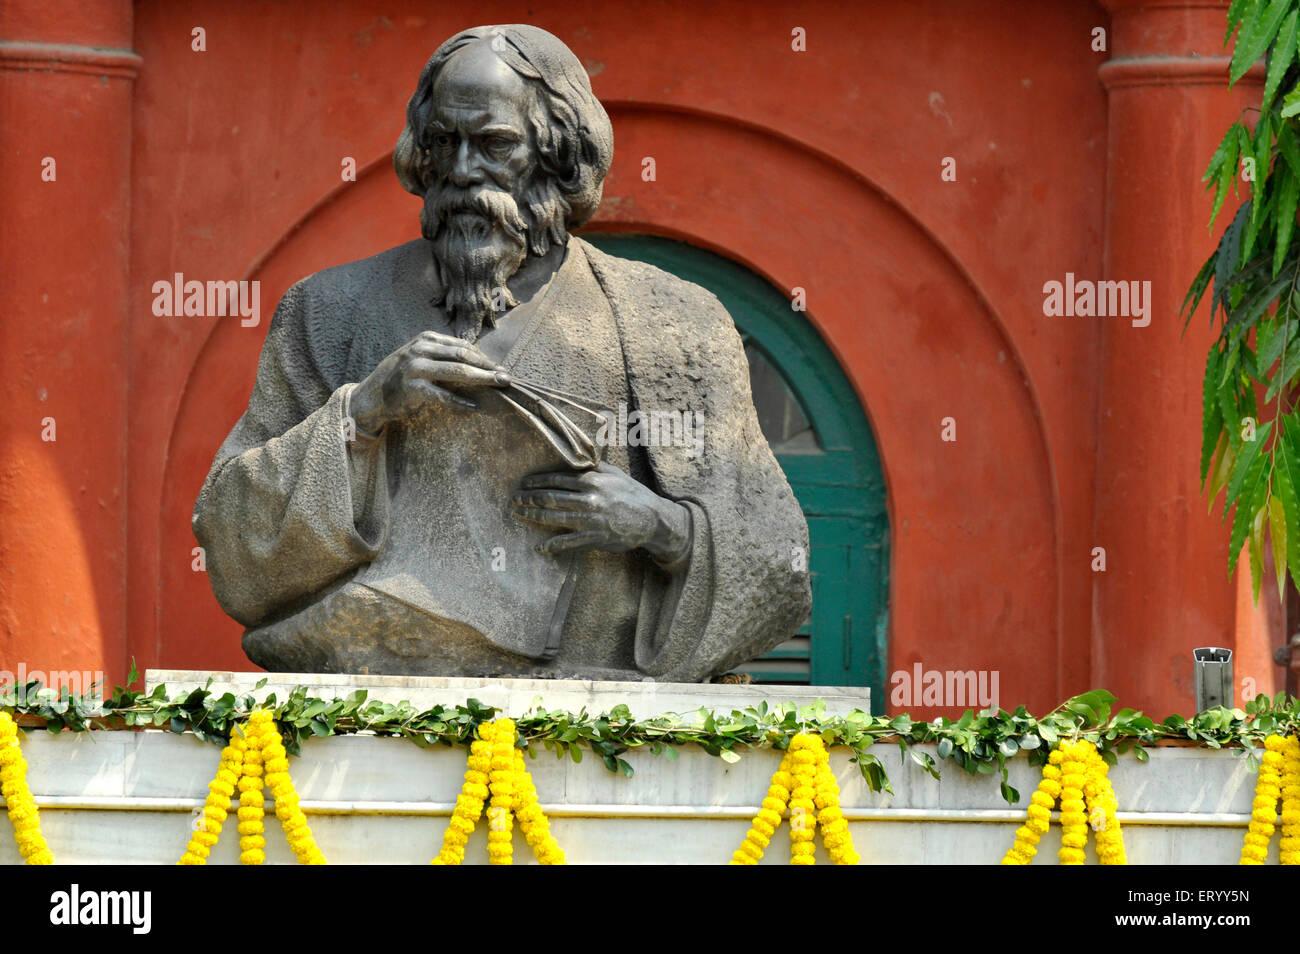 Statue of poet rabindranath tagore at jorasanko Kolkata ; Calcutta ; India - Stock Image